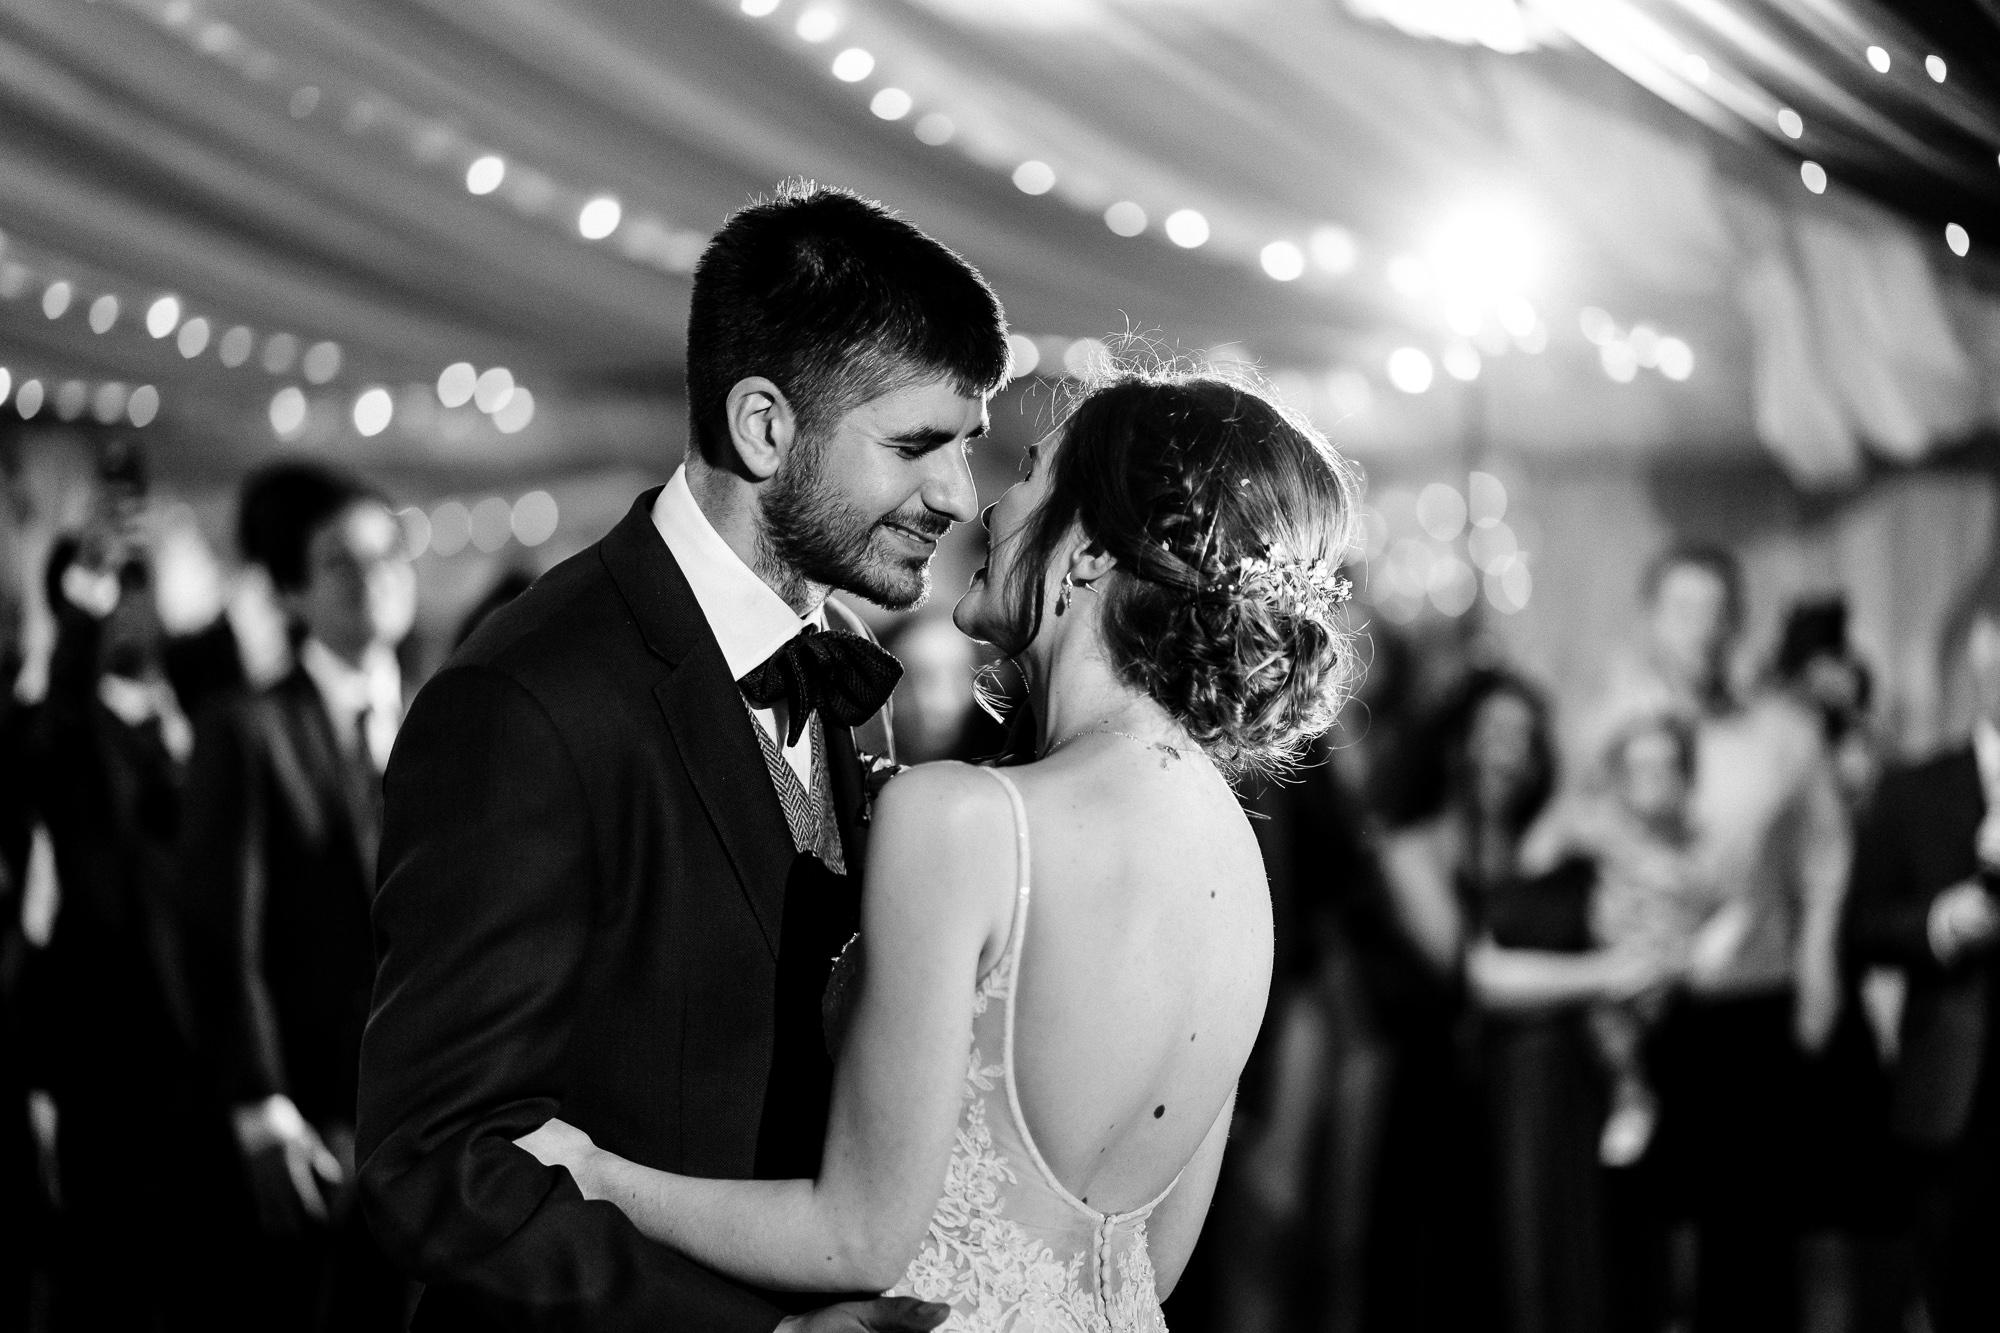 Nunsmere Hall Hotel Wedding photograhpy in cheshire wedding photographer (39 of 42).jpg